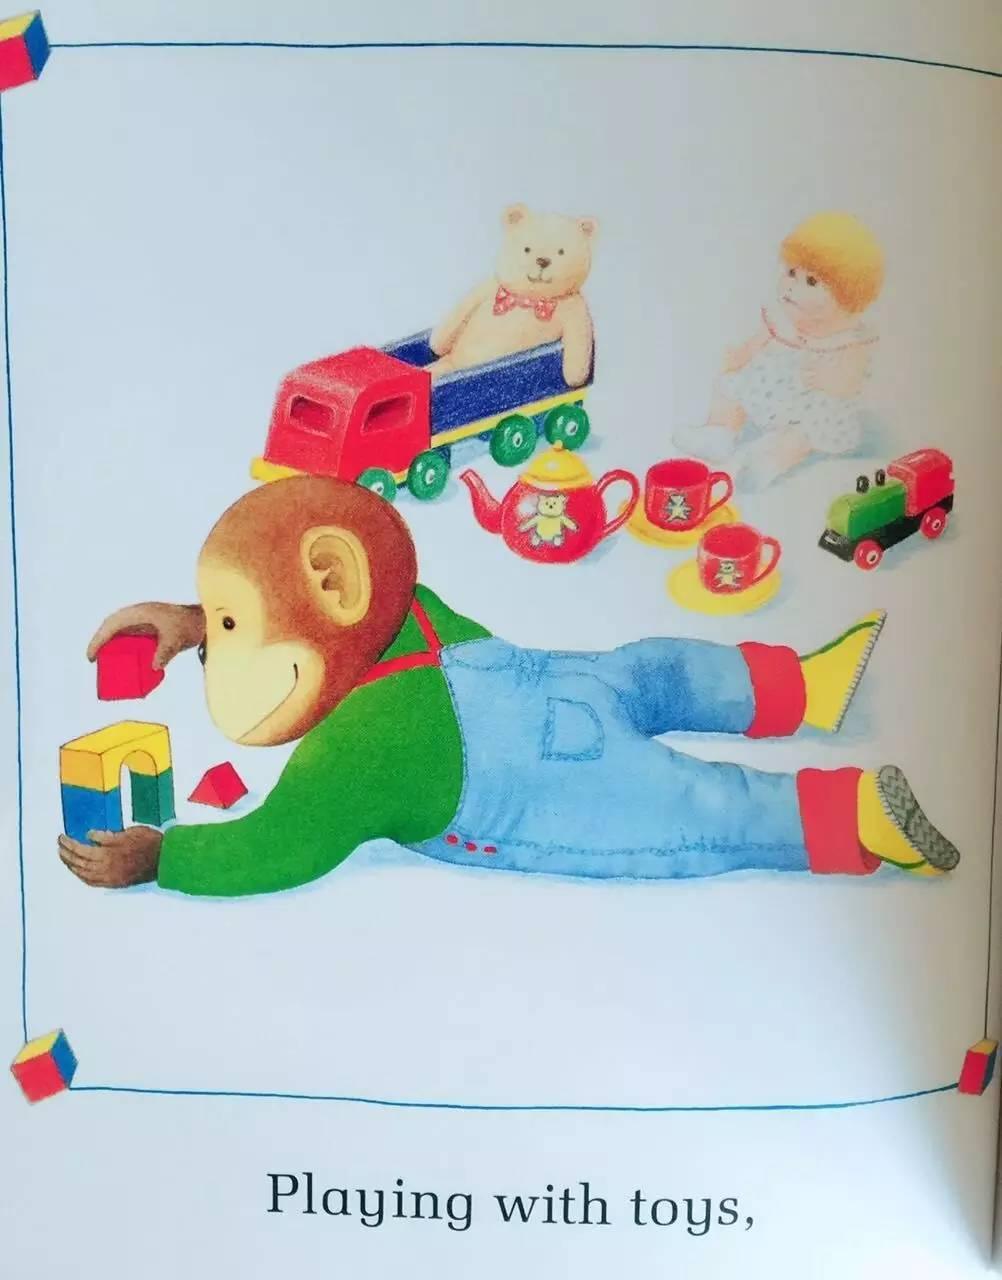 Things I Like 我喜欢的一切 -第5张图片-58绘本网-专注儿童绘本批发销售。